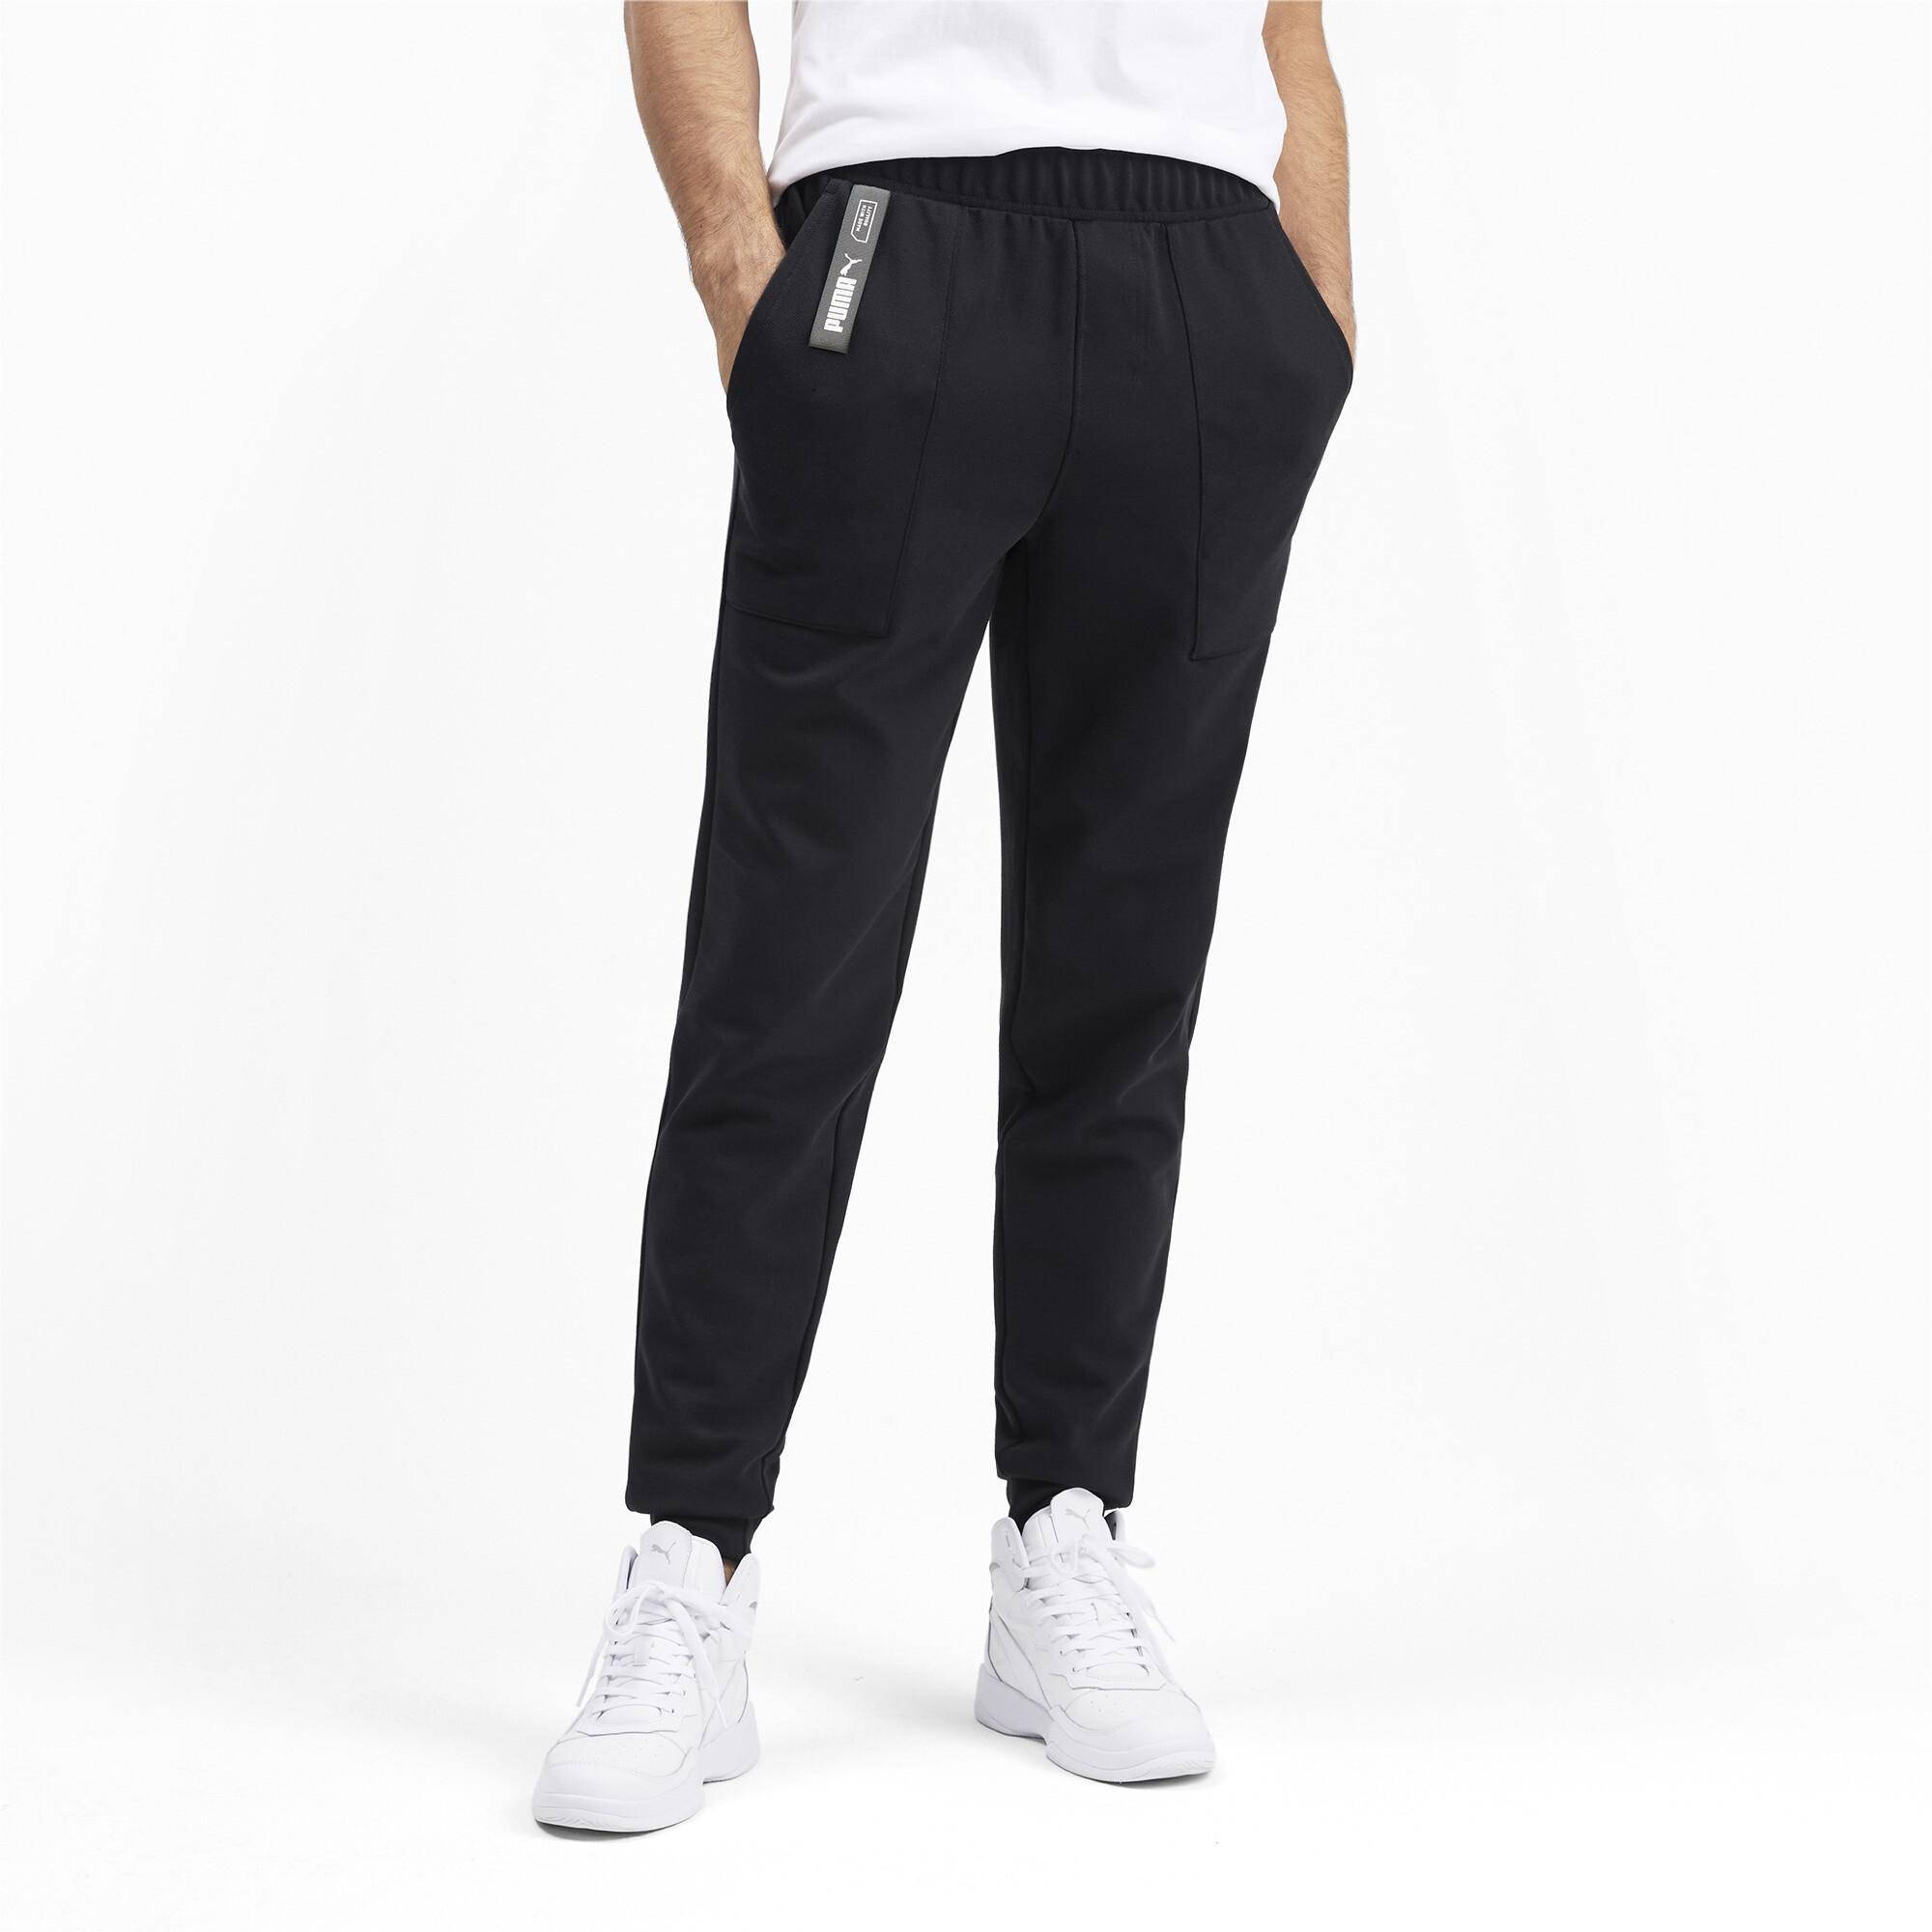 PUMA-NU-TILITY-Men-039-s-Sweatpants-Men-Knitted-Pants-Basics thumbnail 19